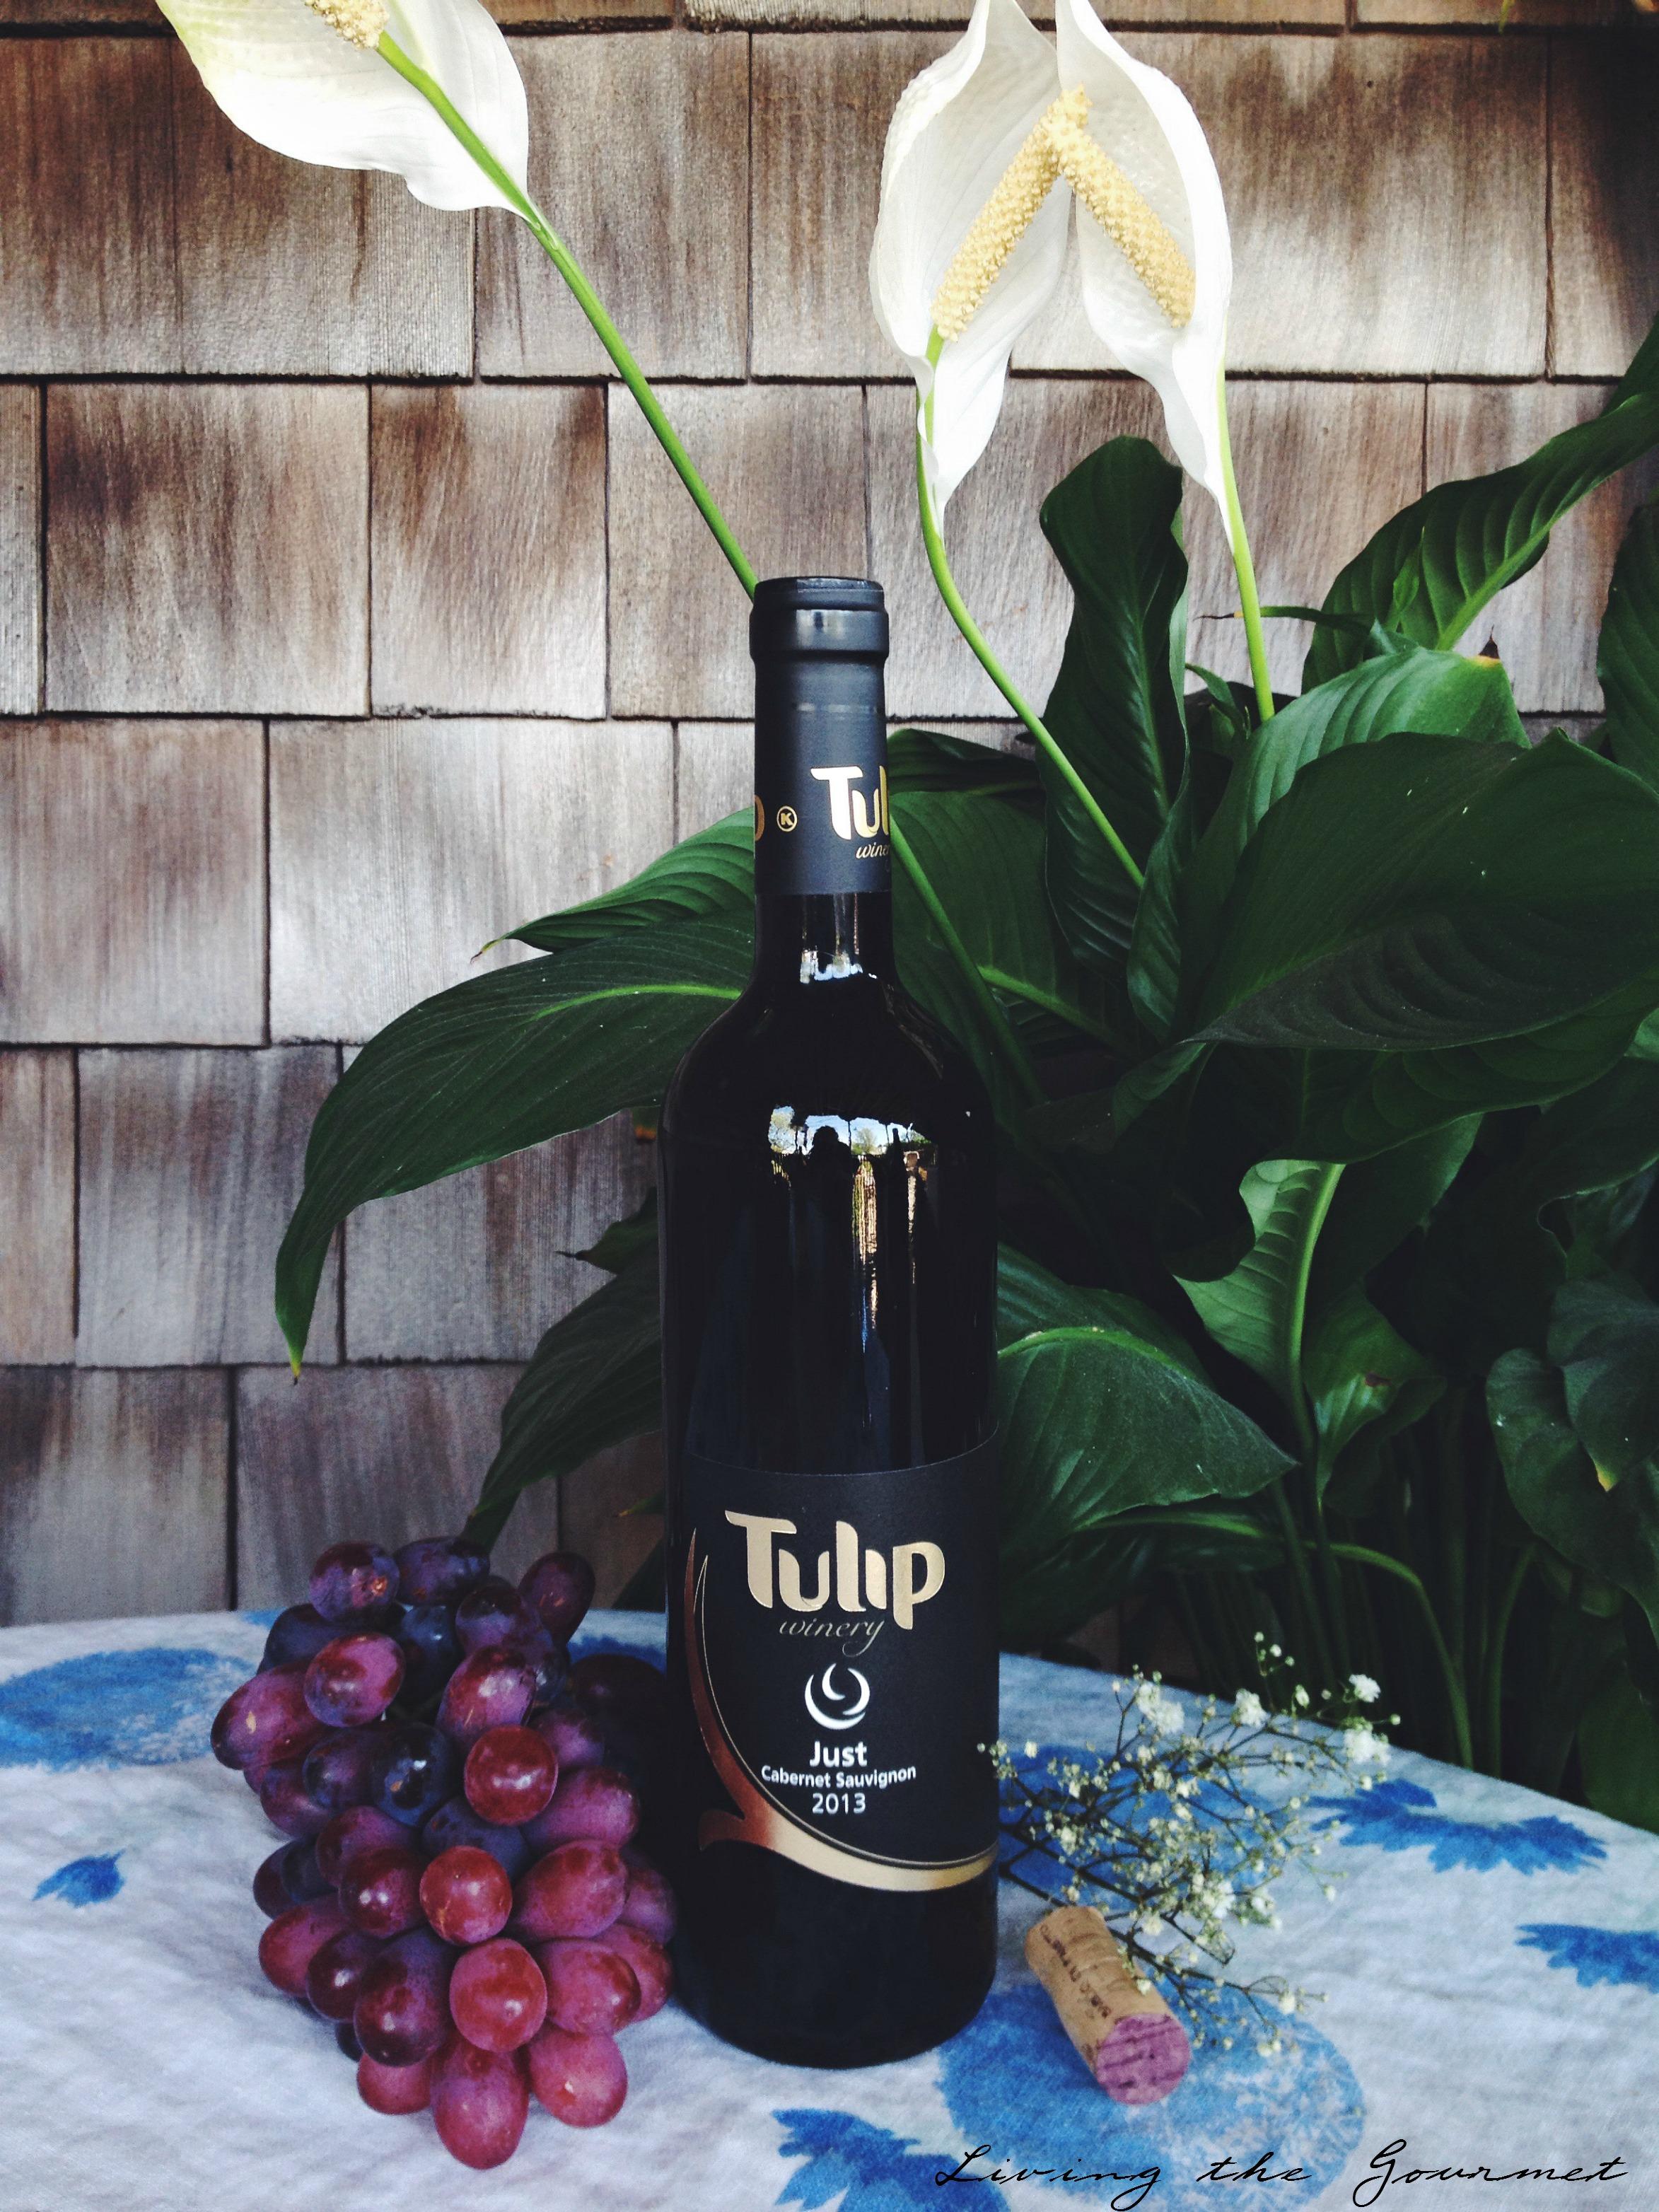 Living the Gourmet: Tulip Winery #WineWeek #LTG